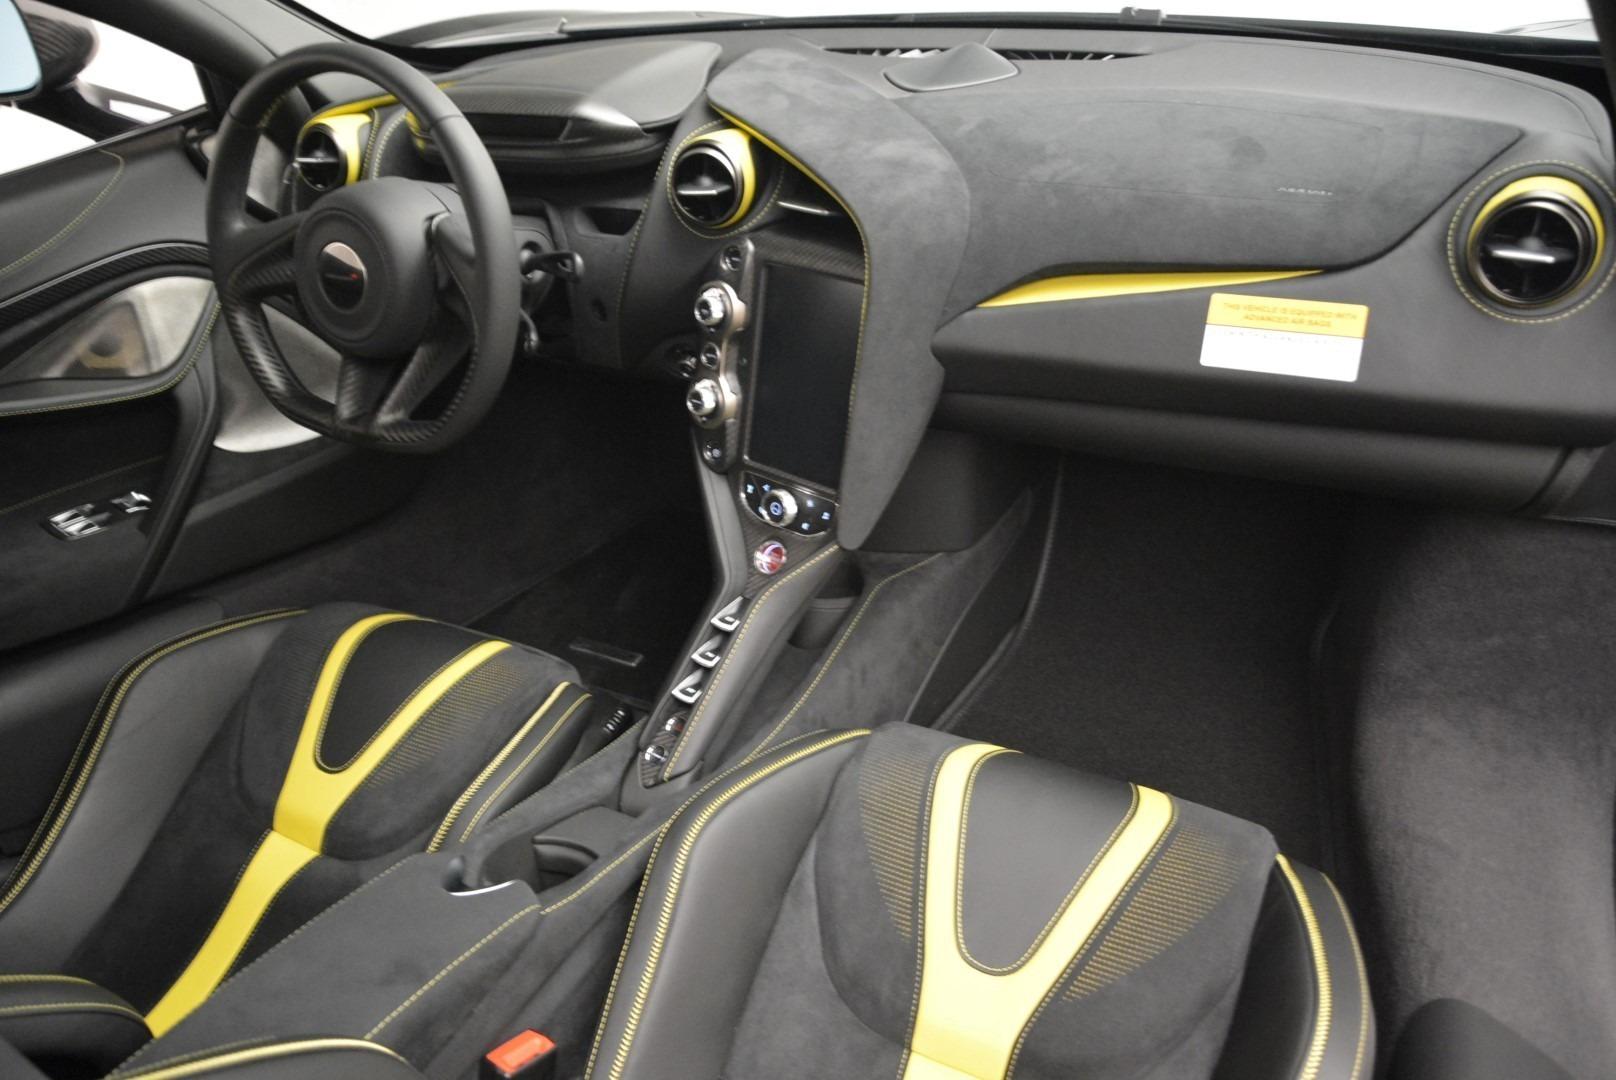 Used 2018 McLaren 720S Coupe For Sale In Westport, CT 2474_p18